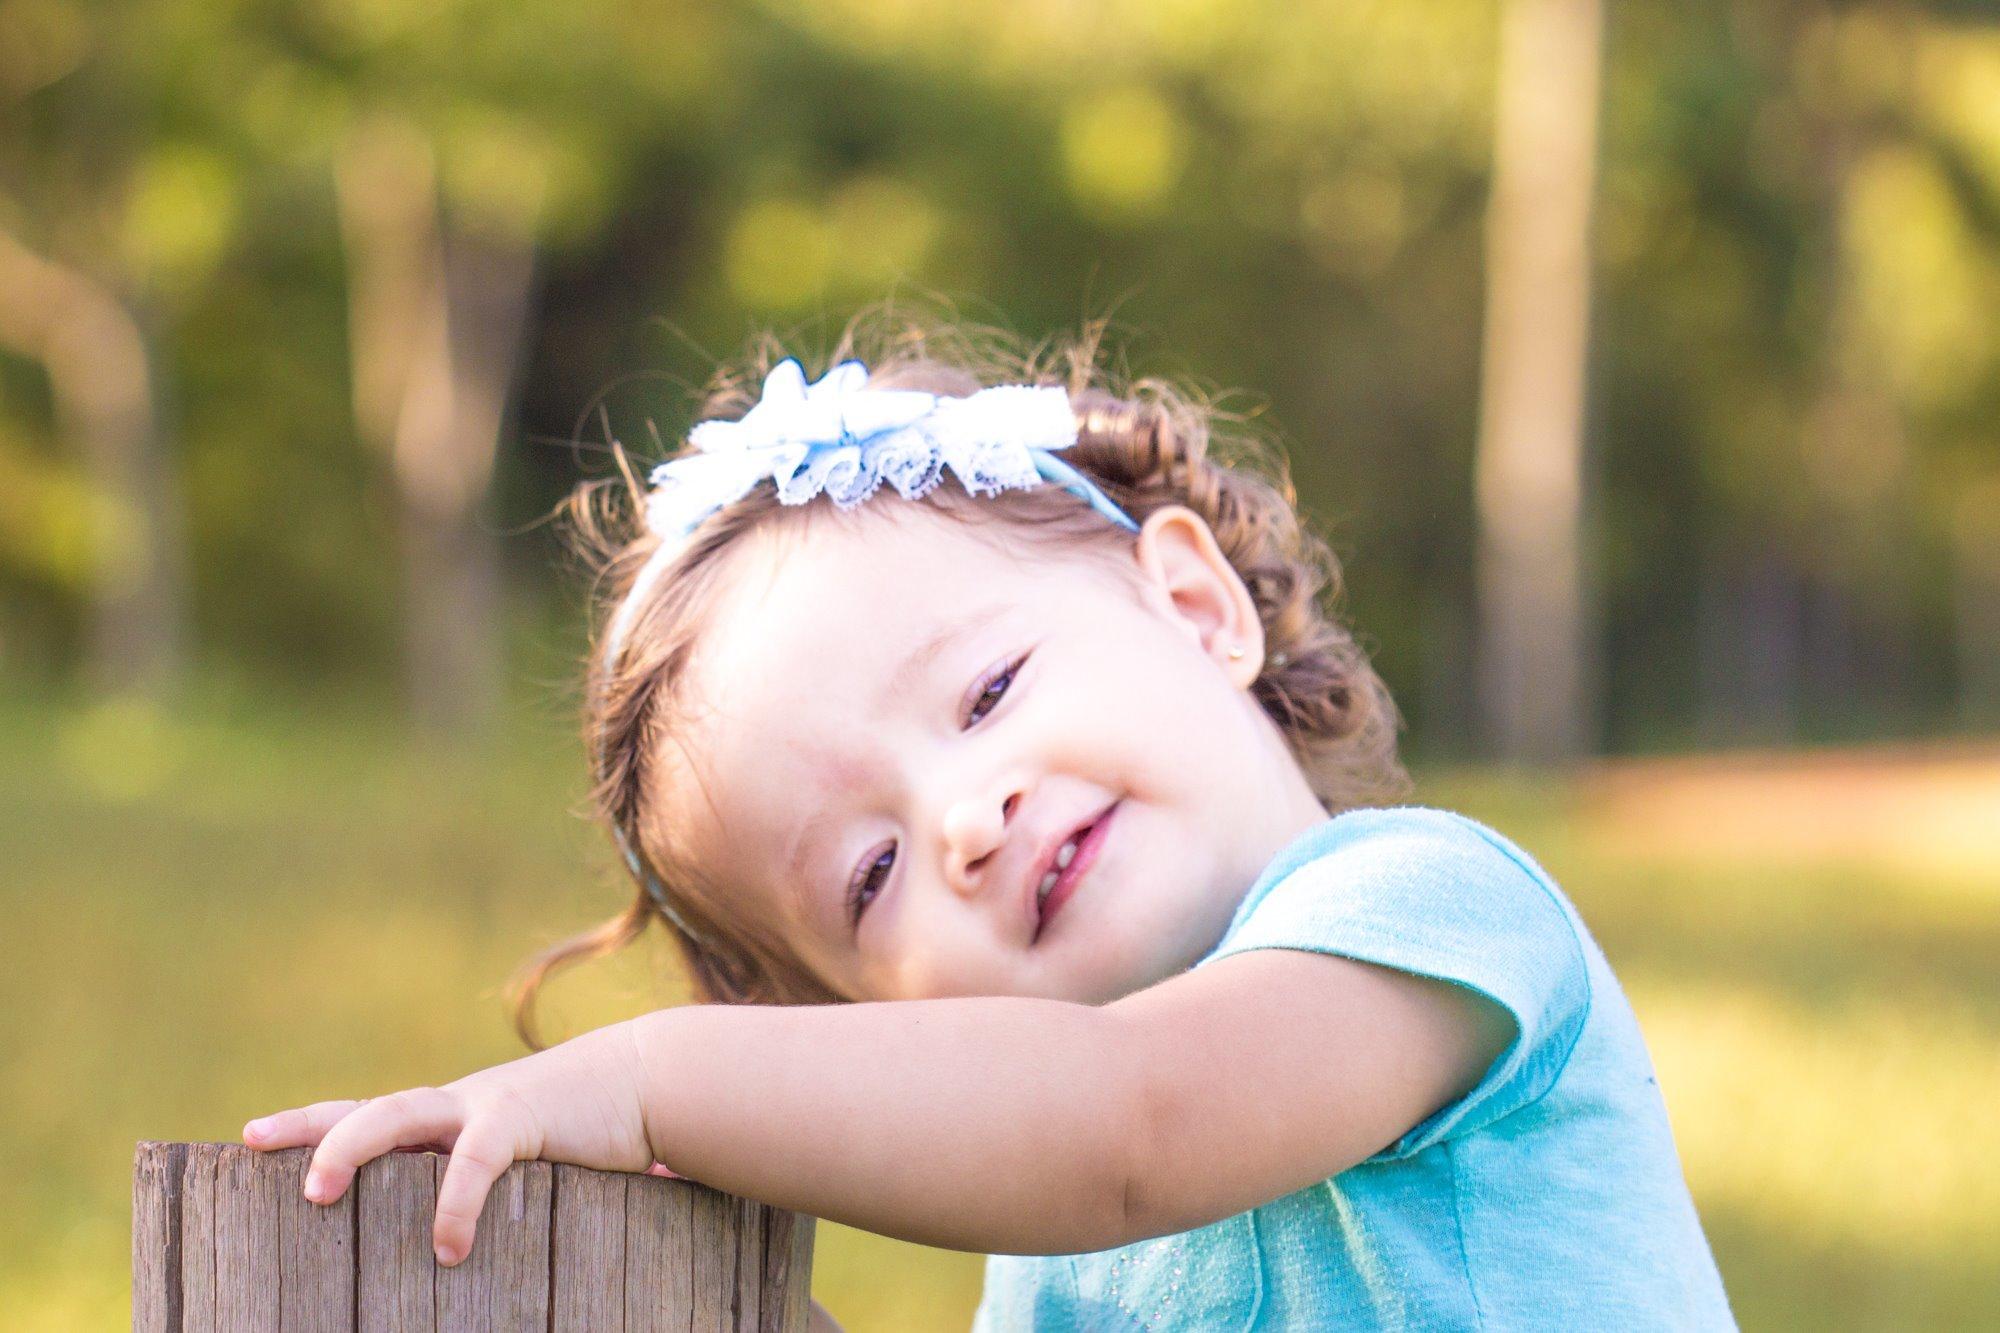 Contate Fabiana Brito Fotografias - Estudio fotográfico Newborn, Gestante